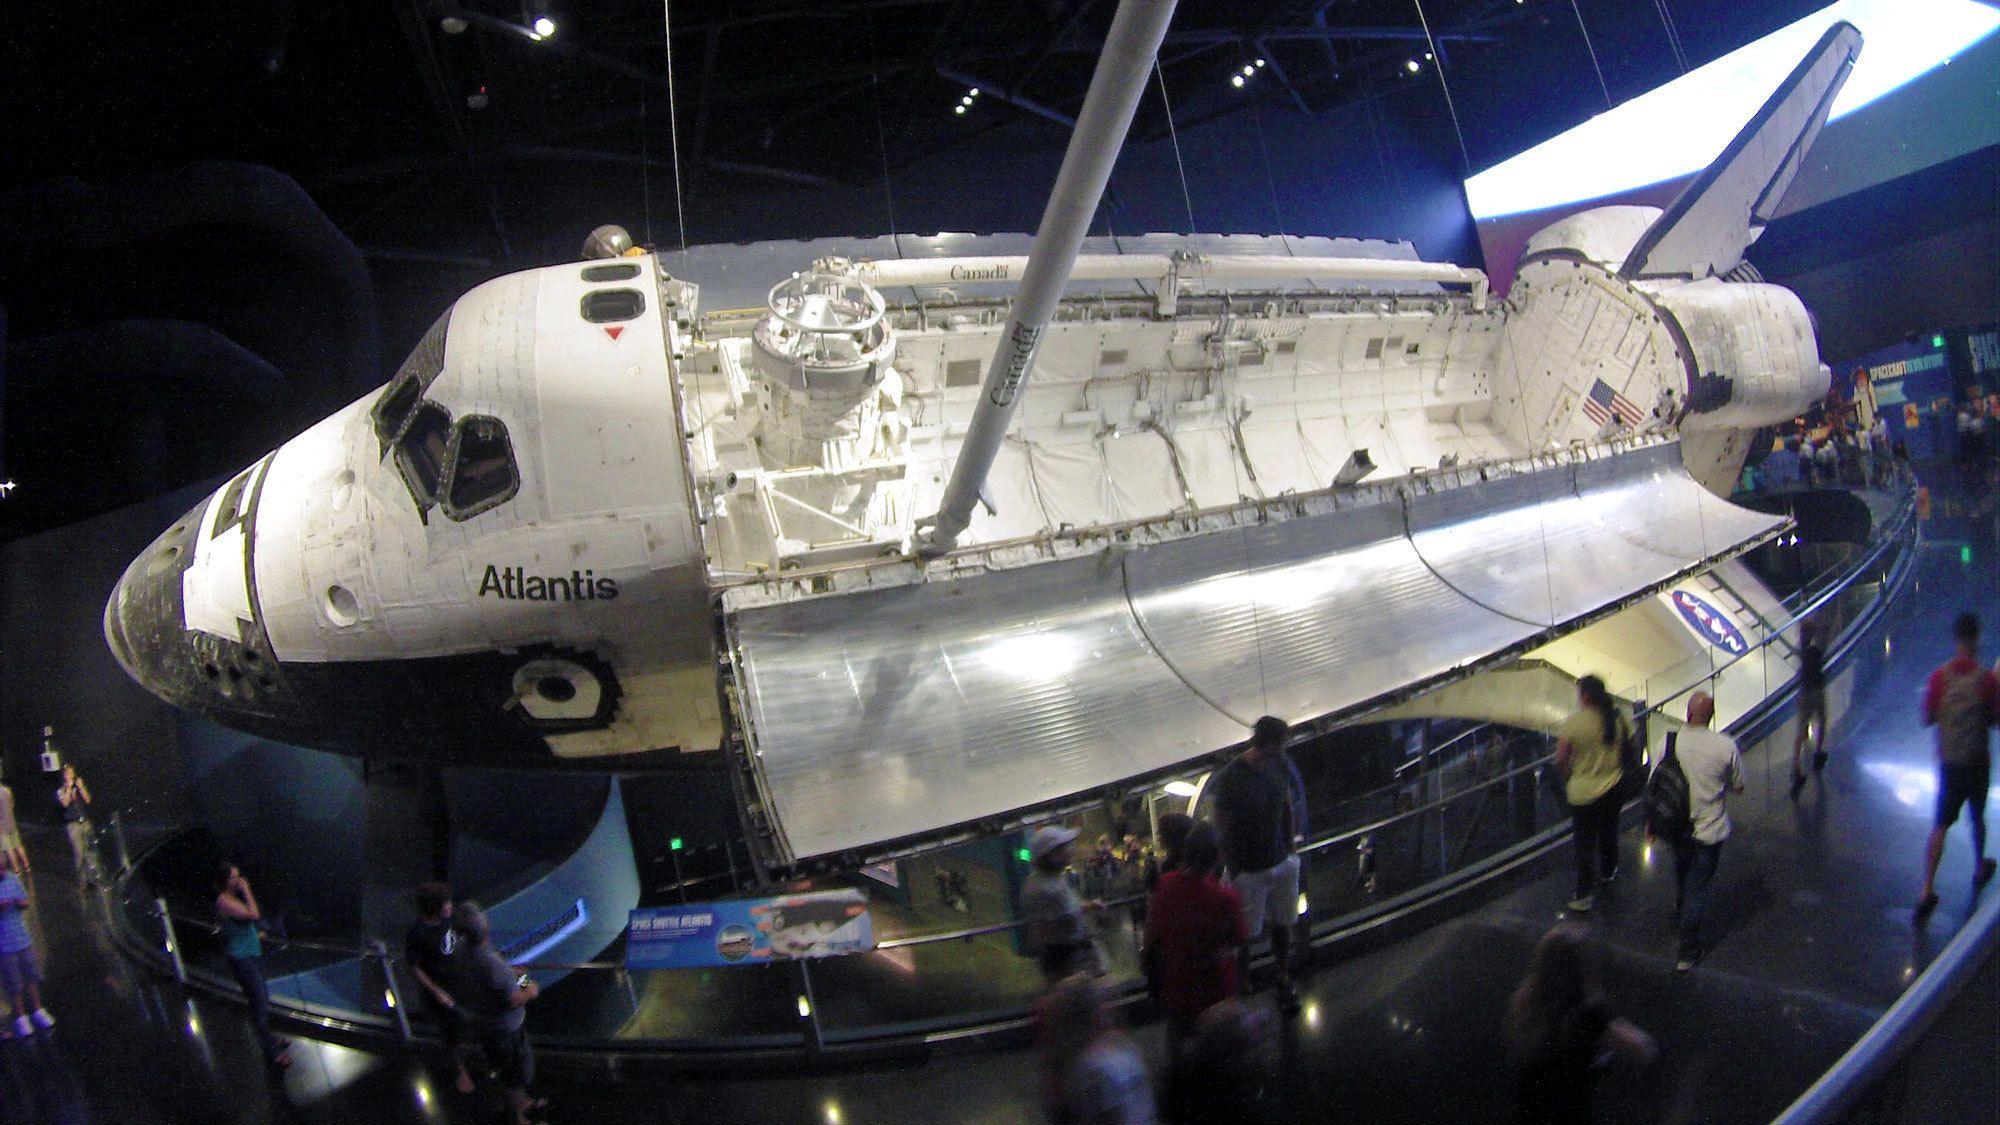 Tour zum Kennedy Space Center mit Outlet-Shopping